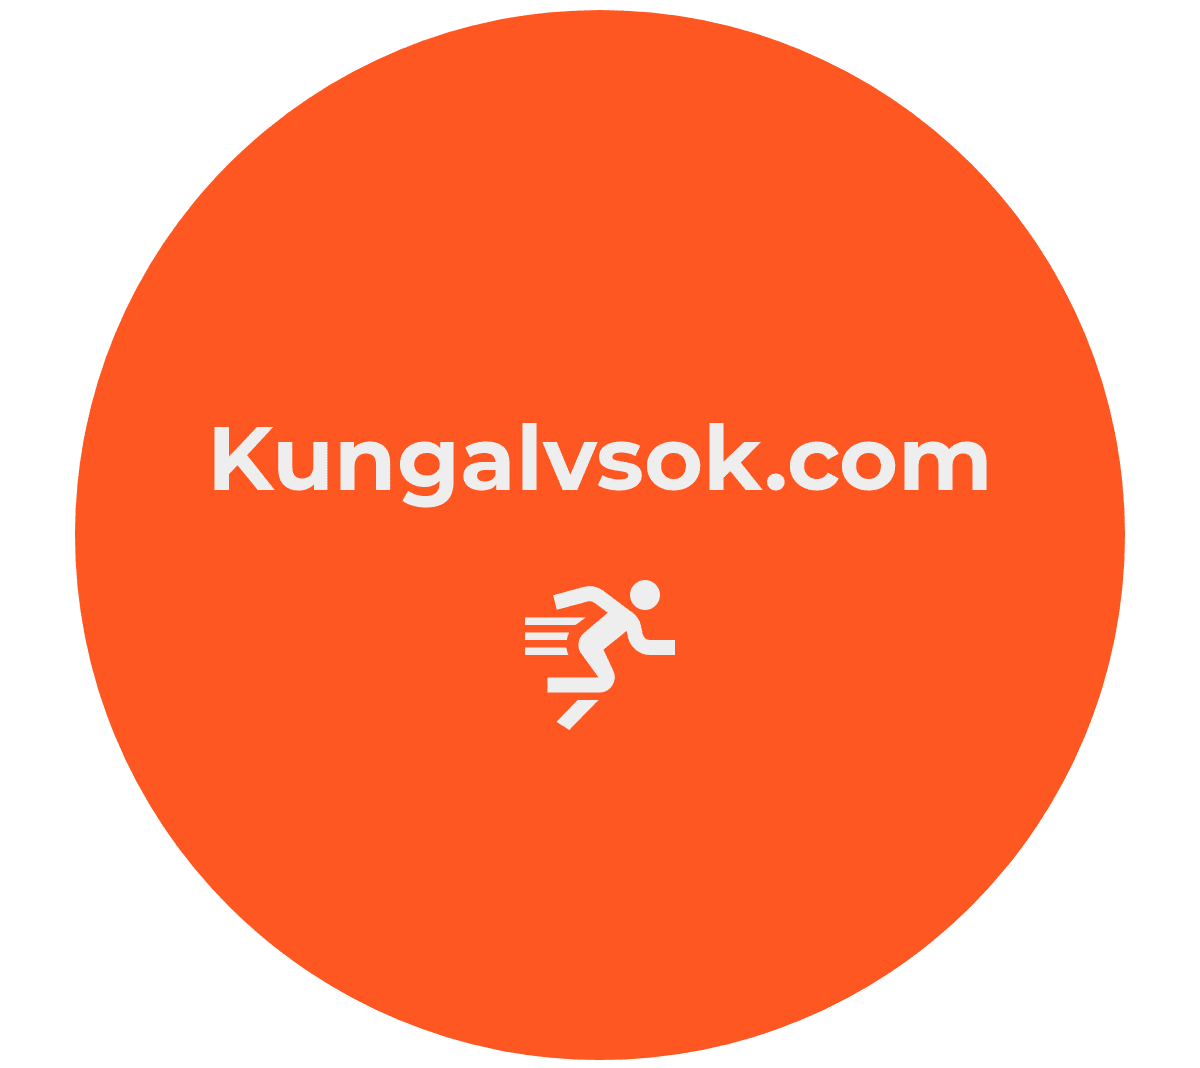 kungalvsok.com